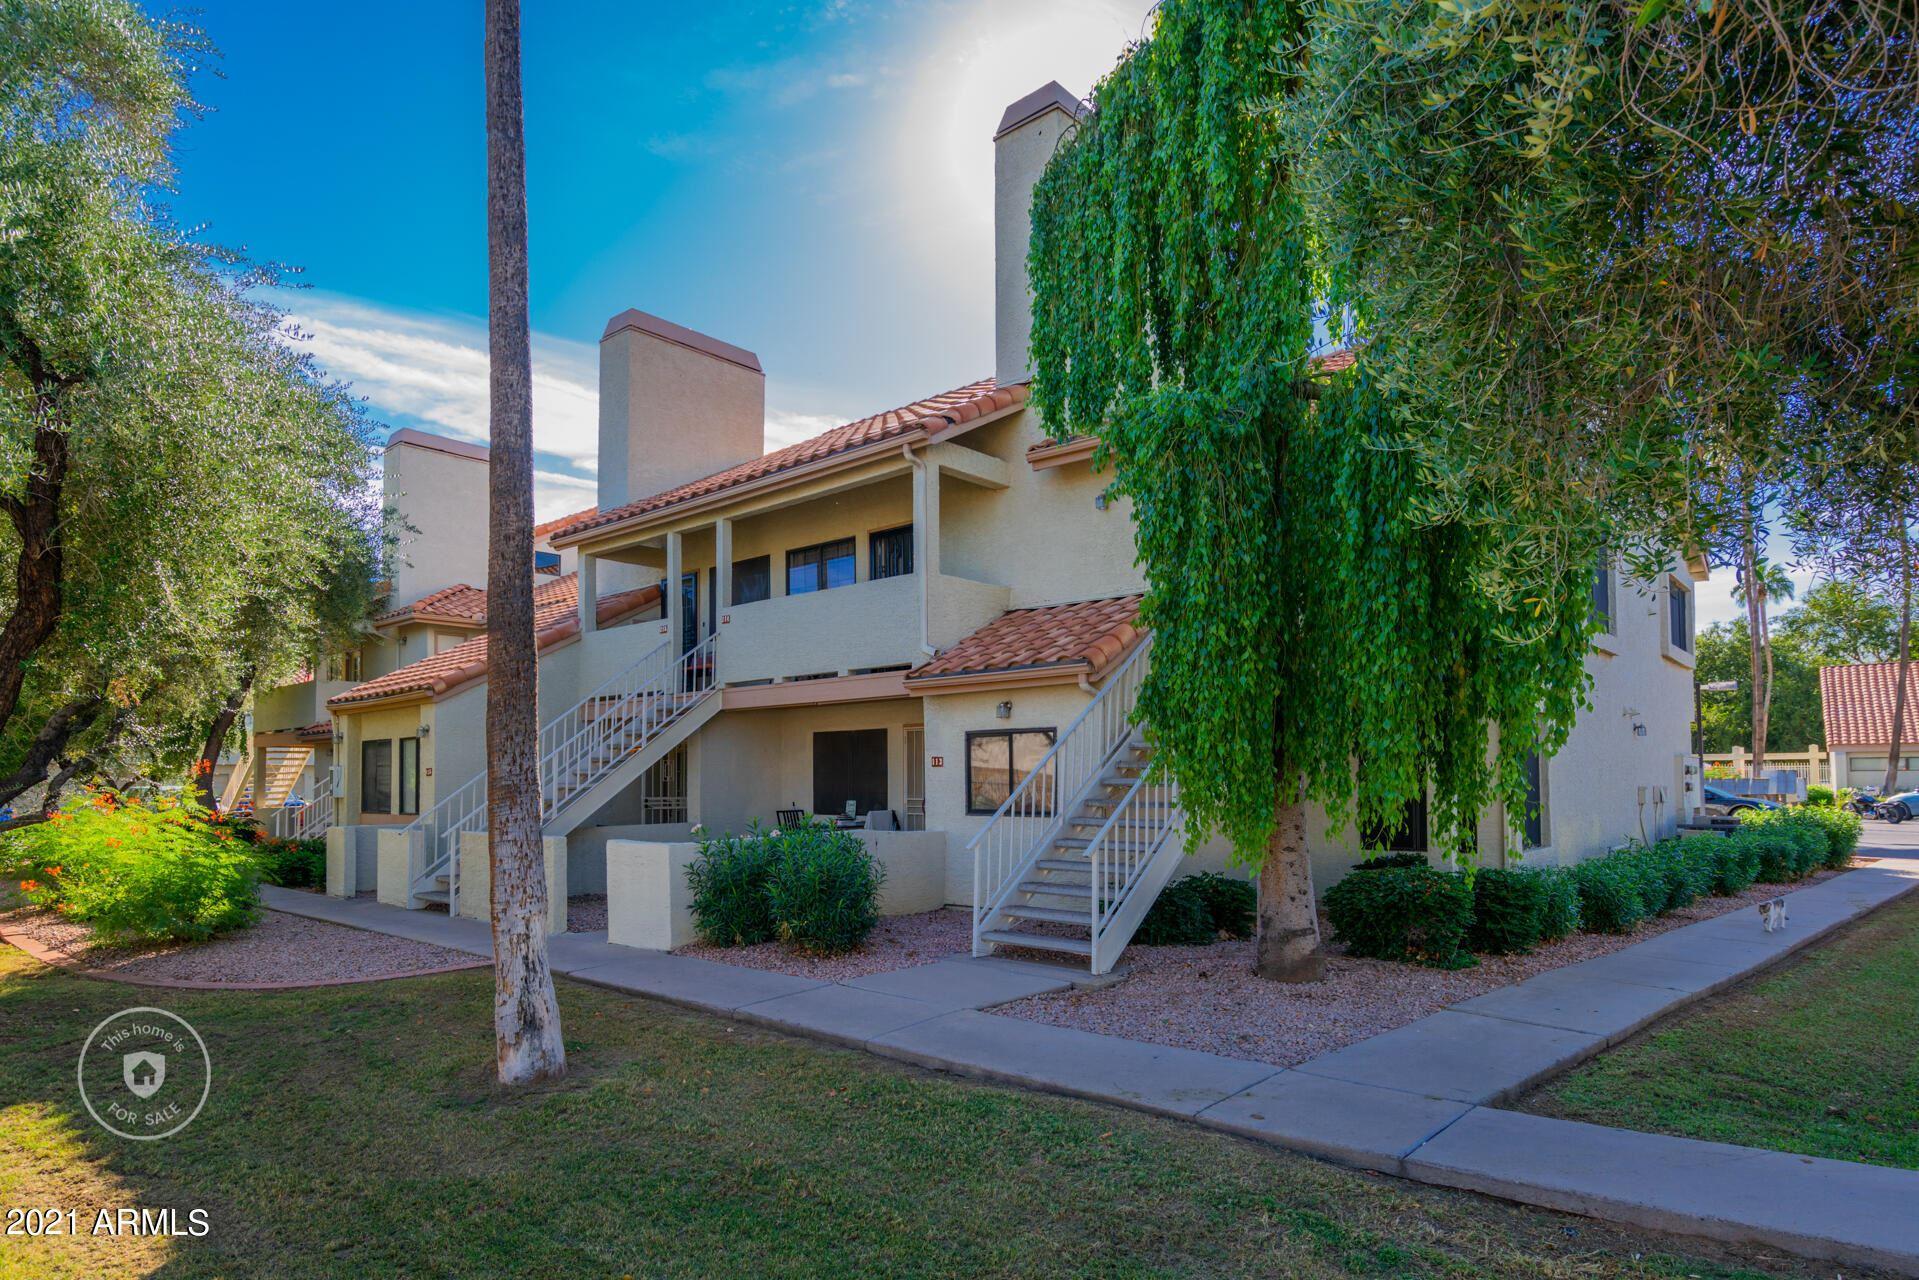 19820 N 13TH Avenue #213, Phoenix, AZ 85027 - MLS#: 6312735